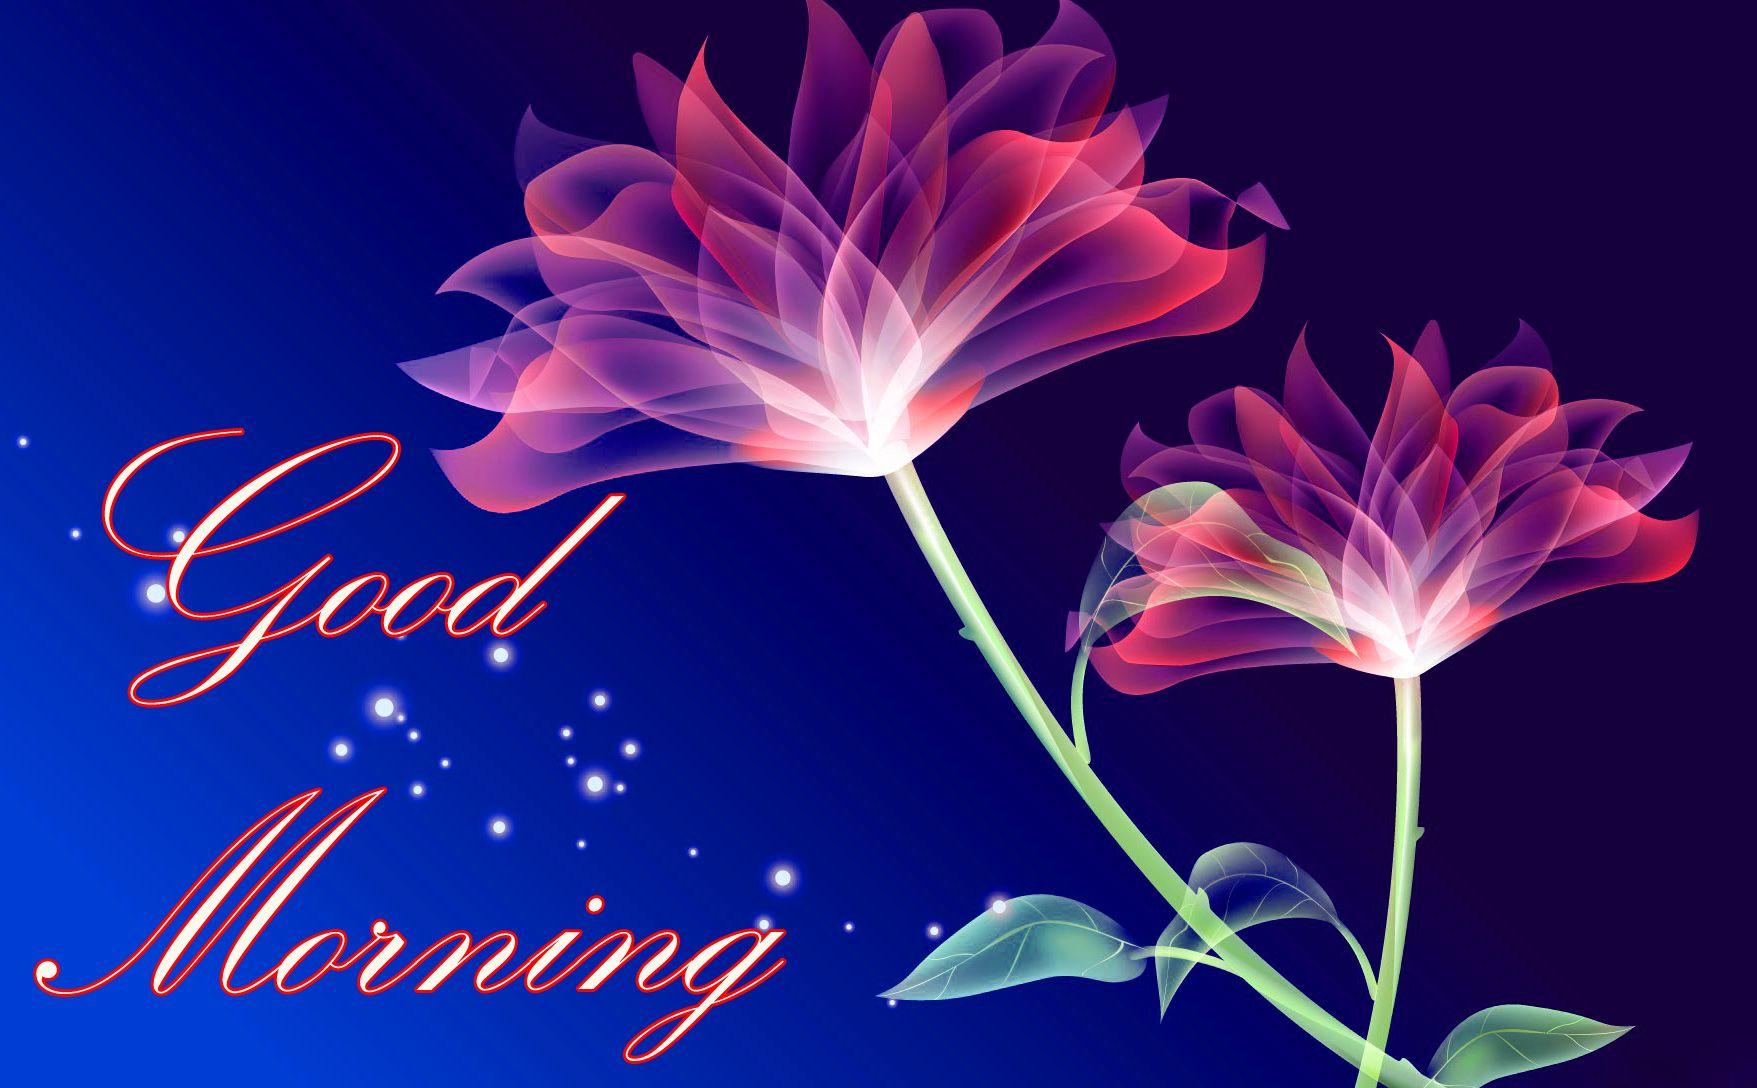 Beautiful Good Morning Images Hd Good Morning Images Good Morning Wallpaper Morning Images